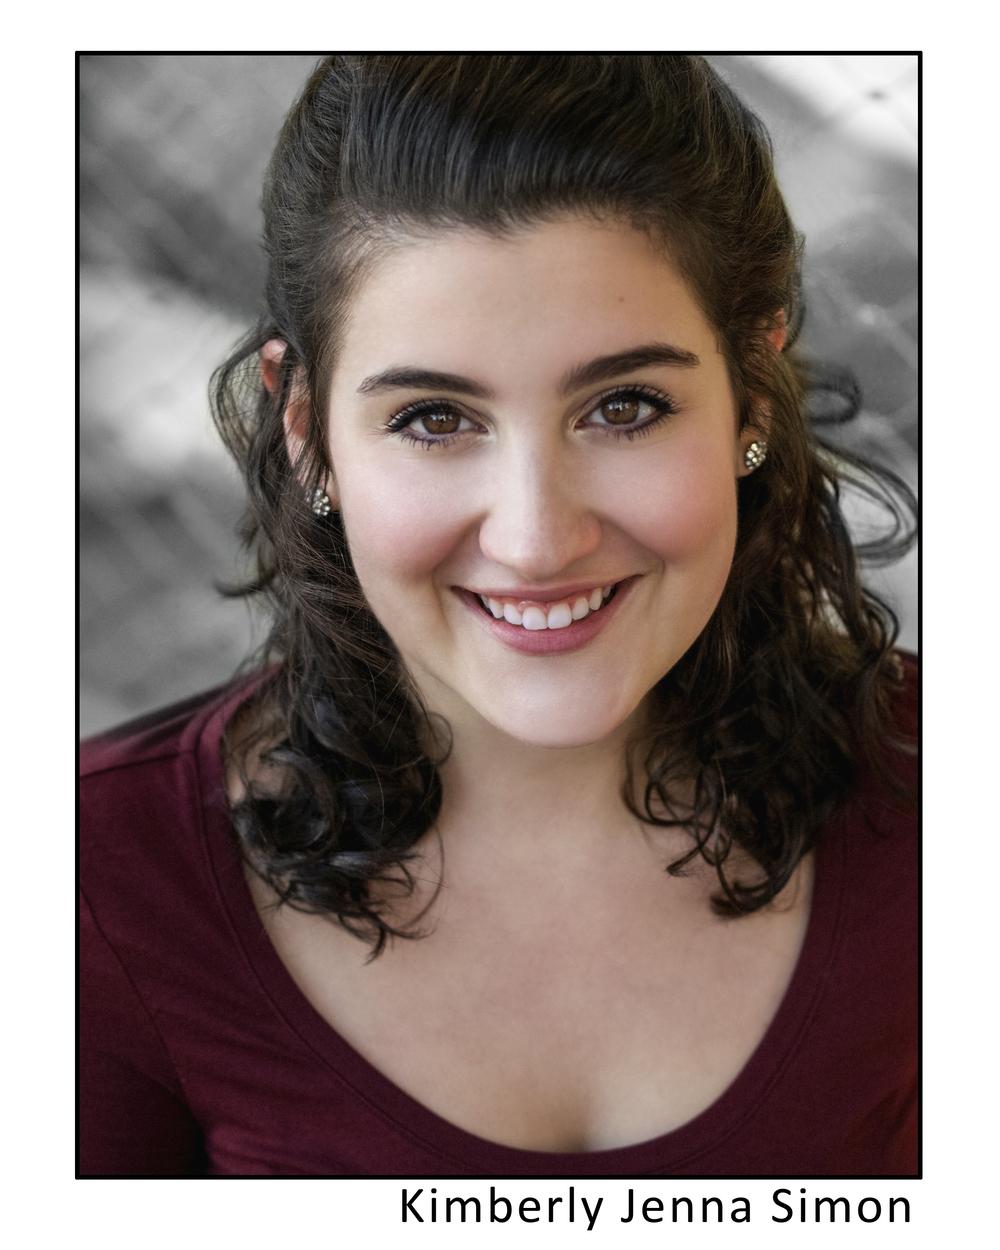 Kimberly Jenna Simon Headshot.jpg